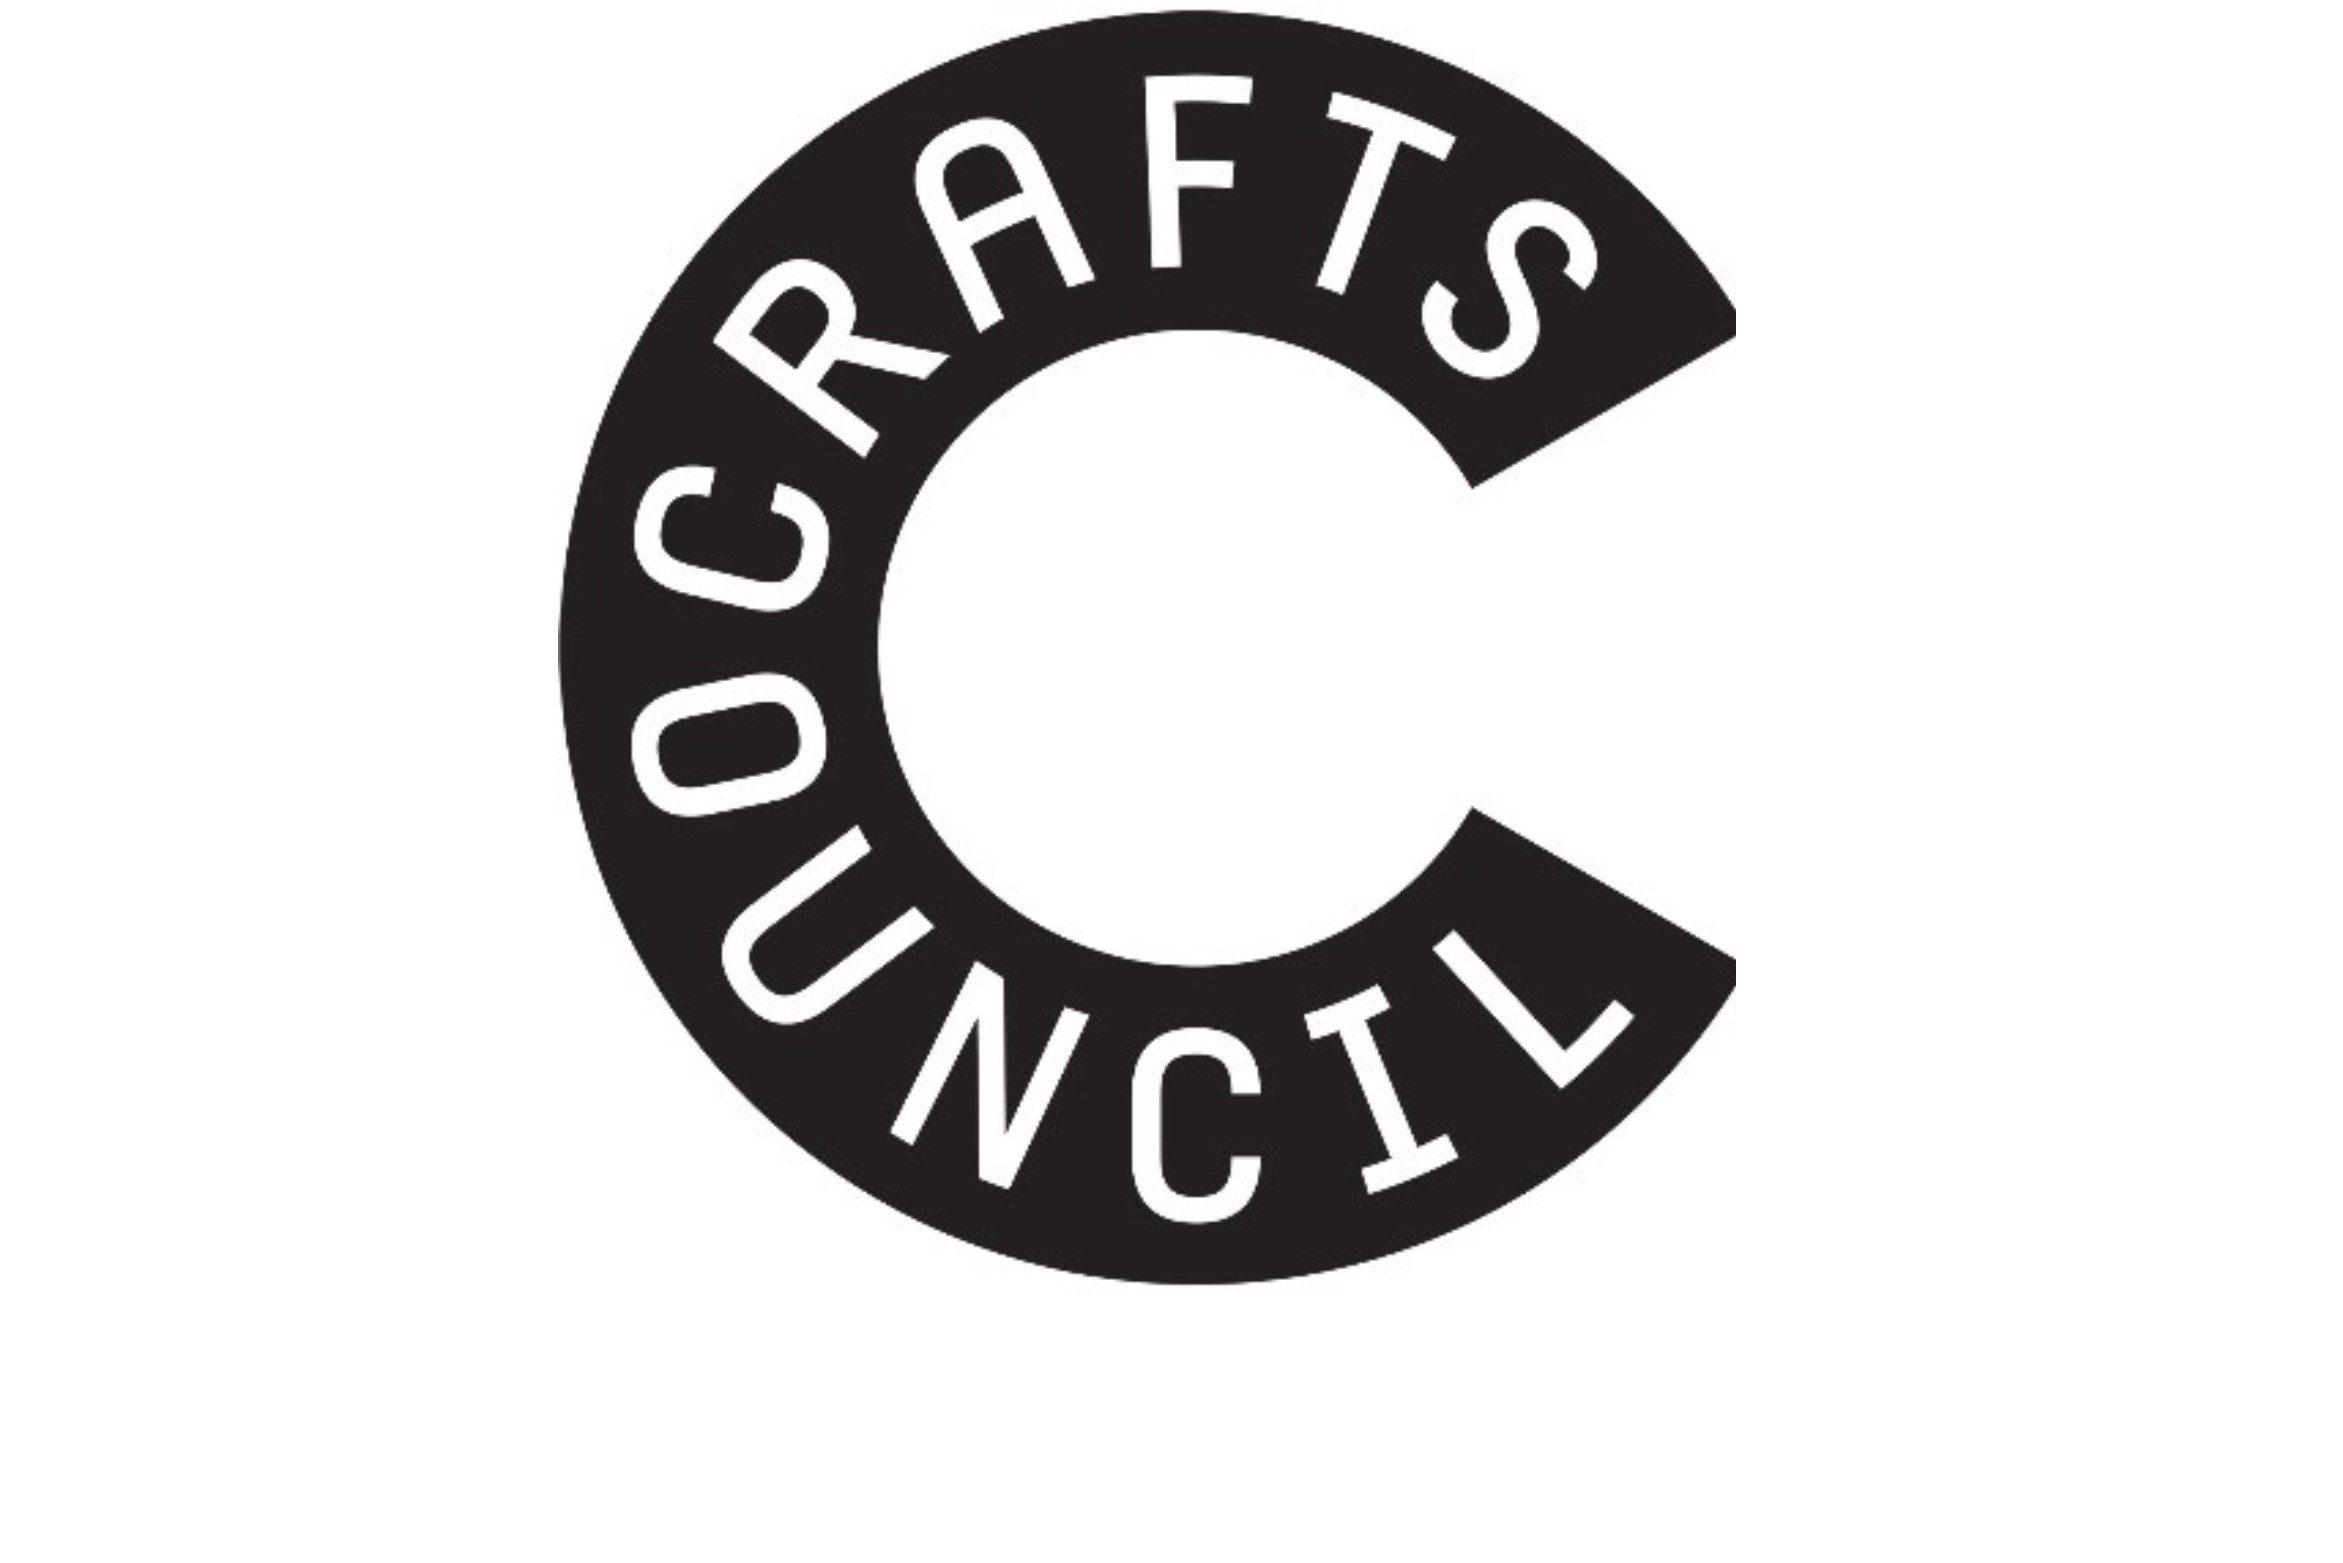 crafts council website 2